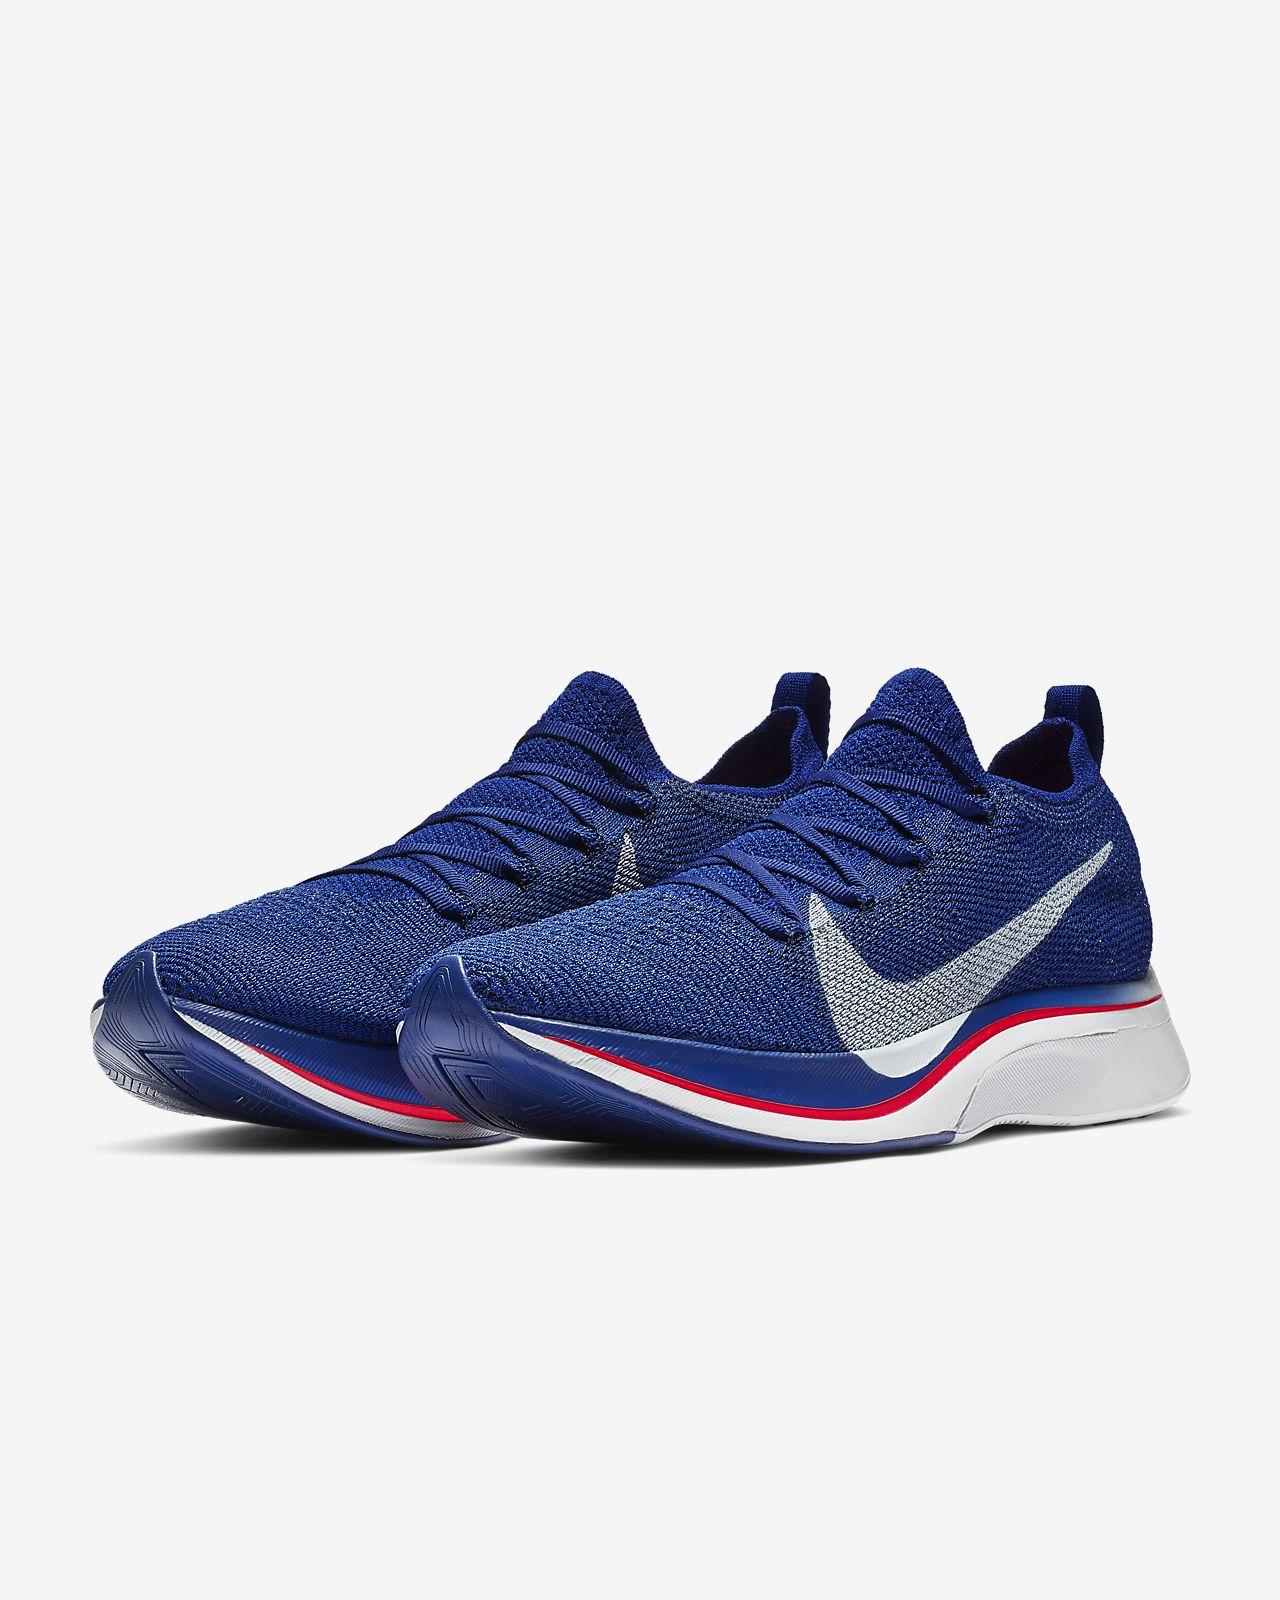 26d605836163c1 Nike Vaporfly 4% Flyknit Running Shoe. Nike.com AU